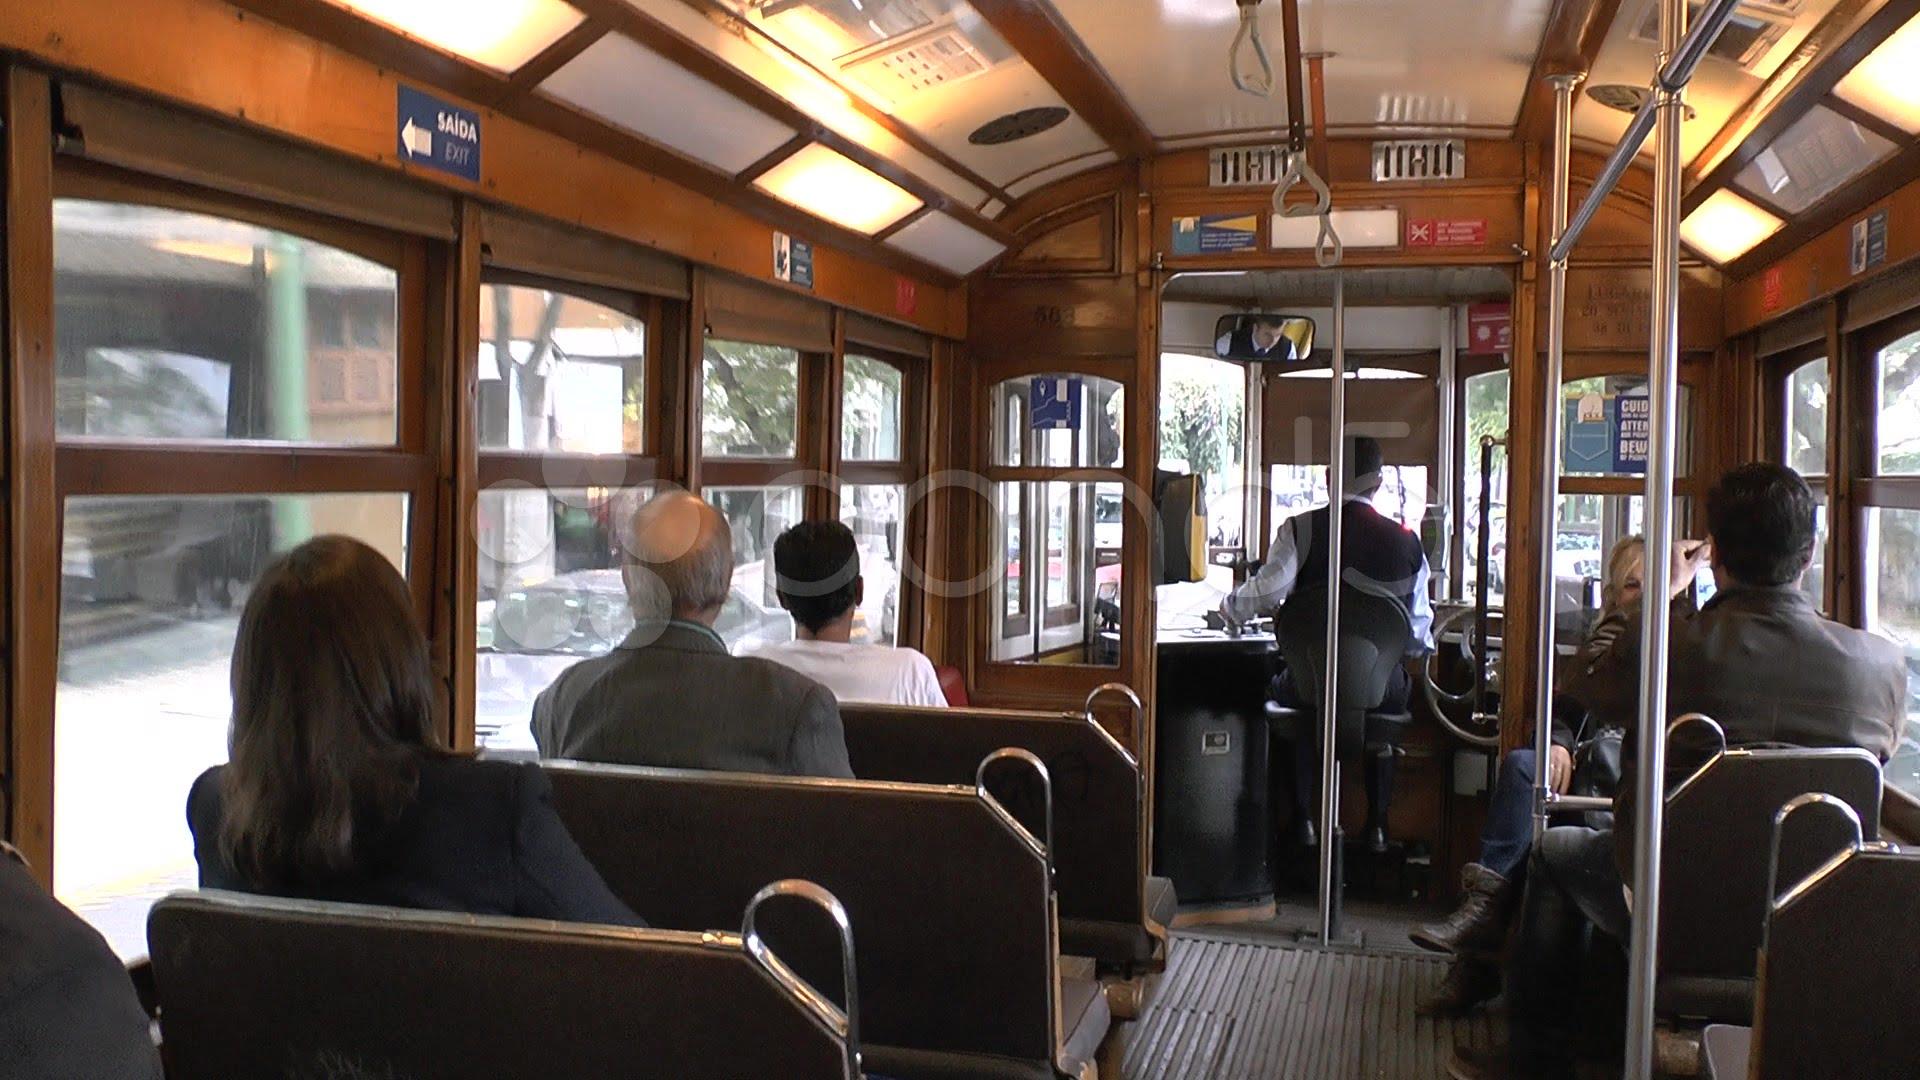 inside of Lisbon tramway 28